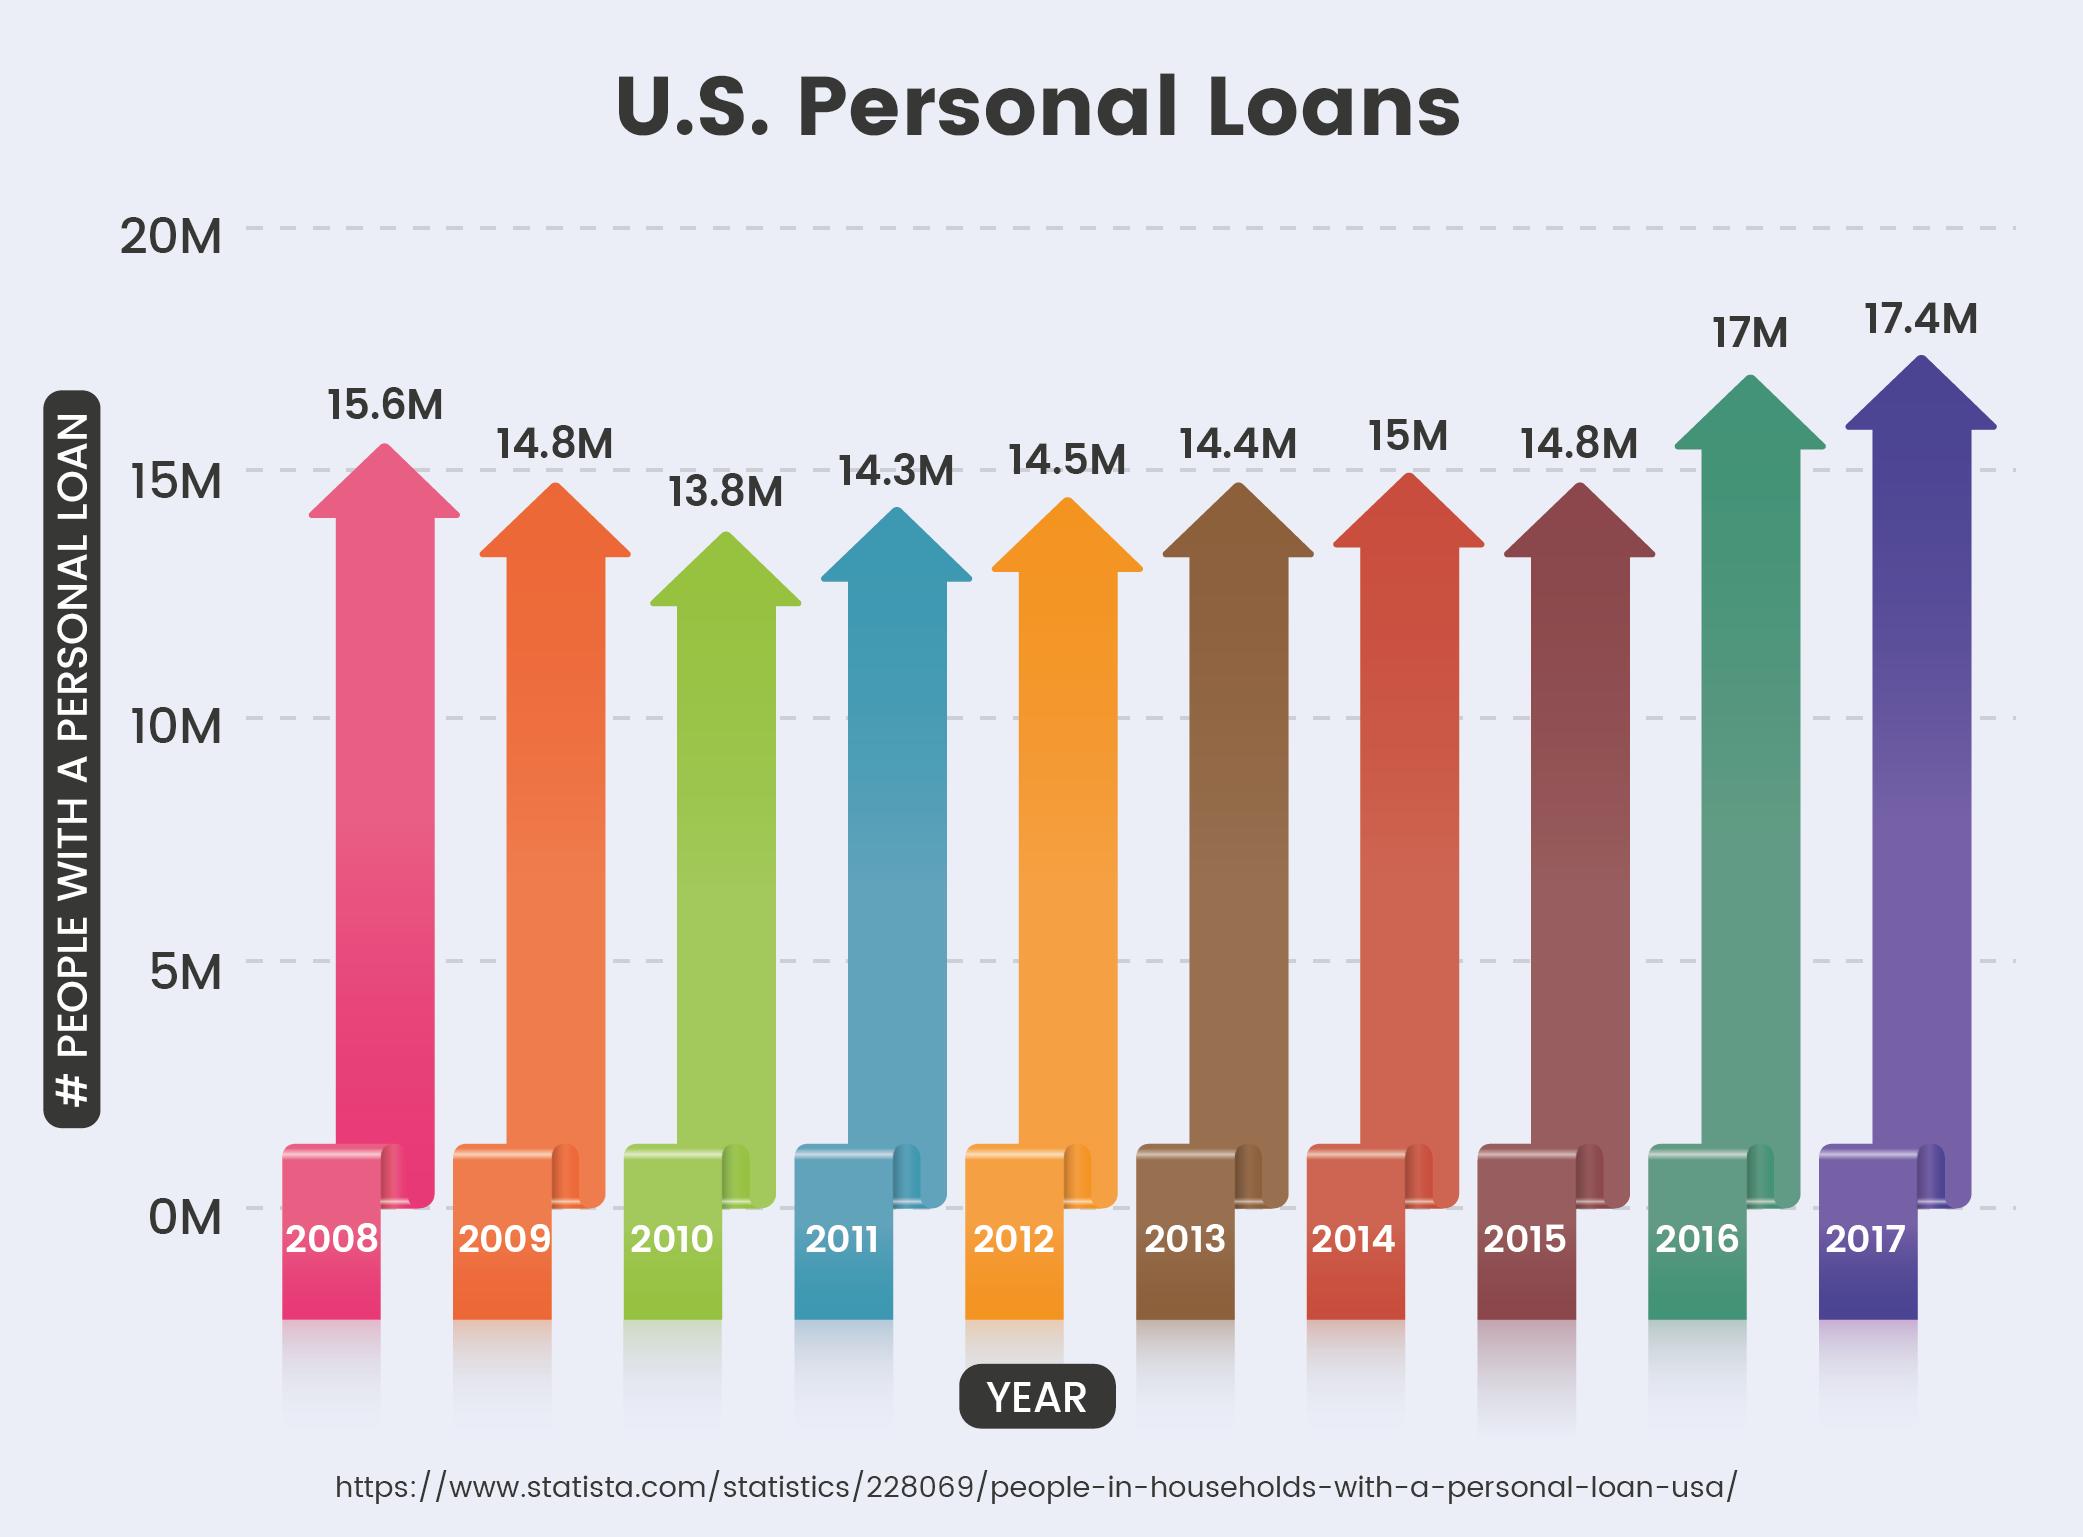 U.S. Personal Loans